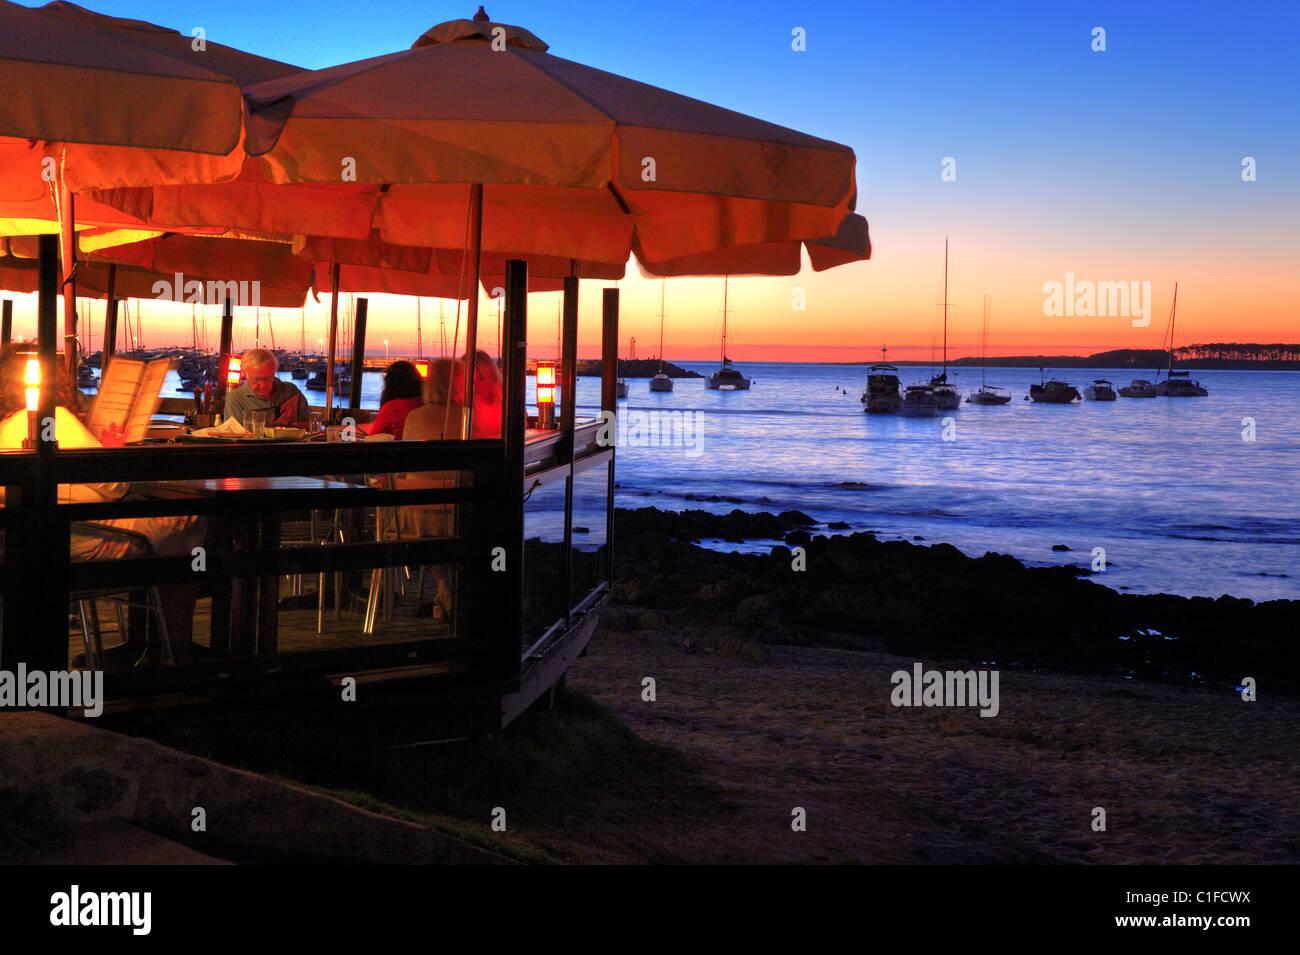 Bar and yatchs at Punta del Este coast, at sunset. Maldonado, Uruguay, south america - Stock Image